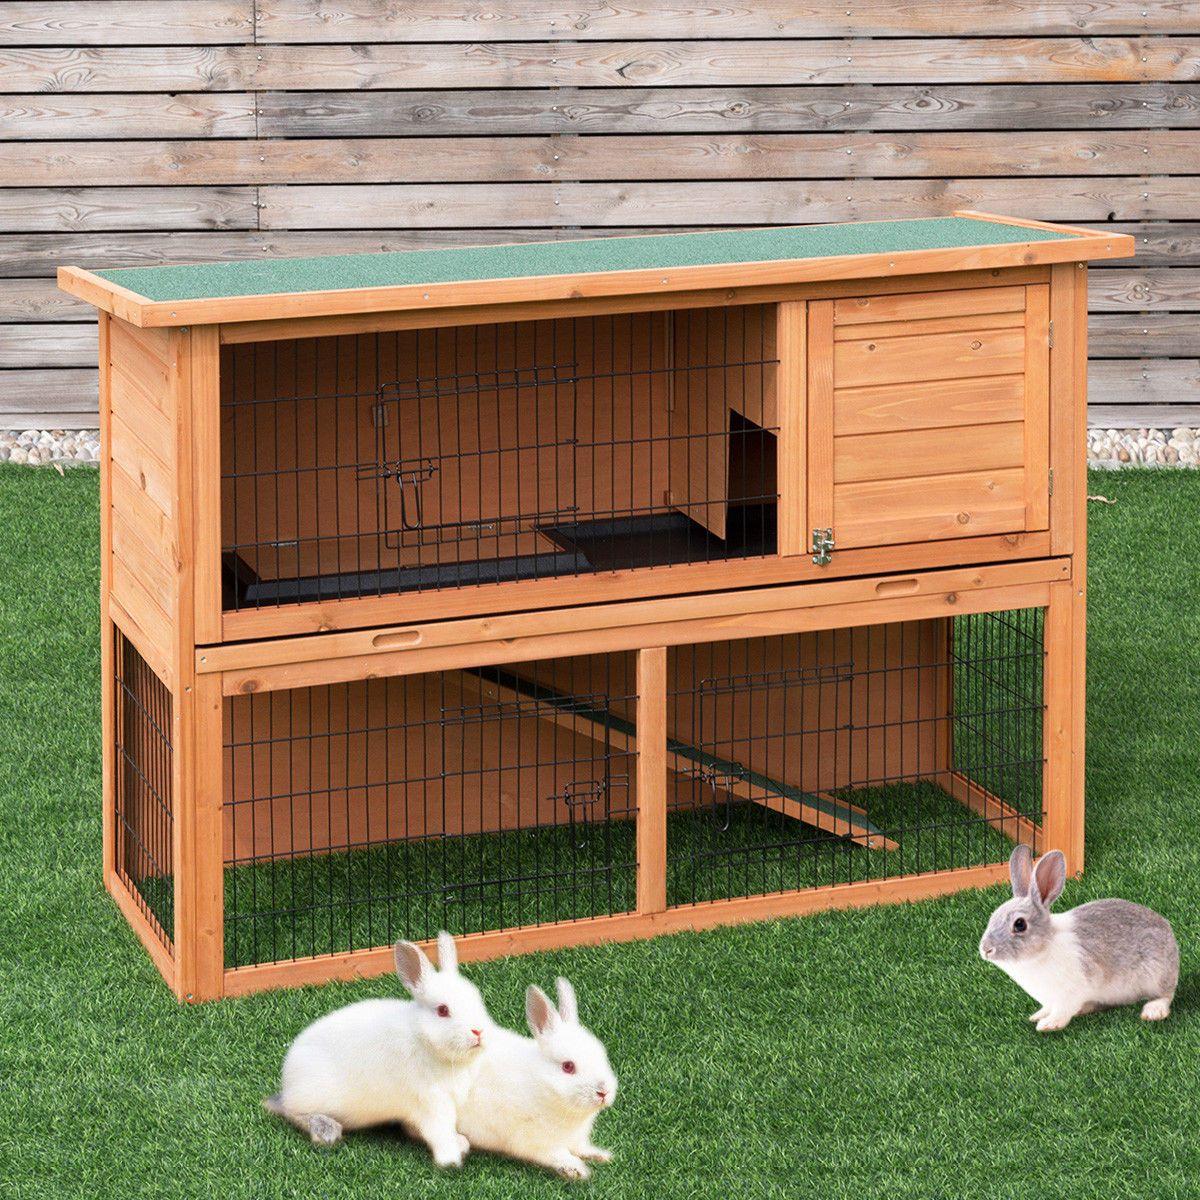 zest hutches chicken gardensite co run and original structures with htm rabbit pig hutch guinea uk garden